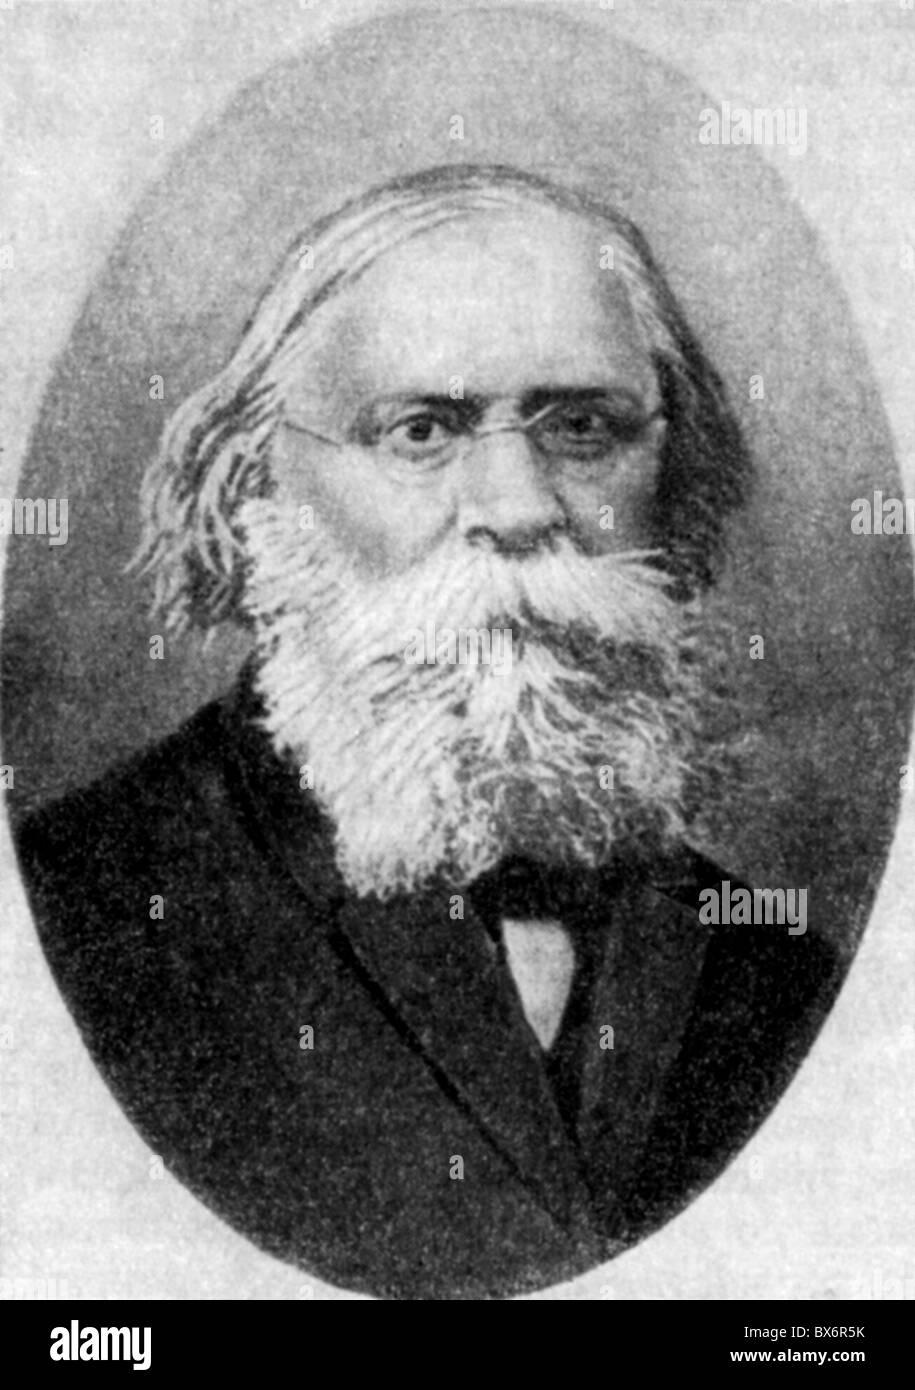 Lavrov, Pyotr Lavrovich, 14.6.1823 - 6.2.1900, Russian poet, publicist, sociologist, portrait, late 19th century, - Stock Image